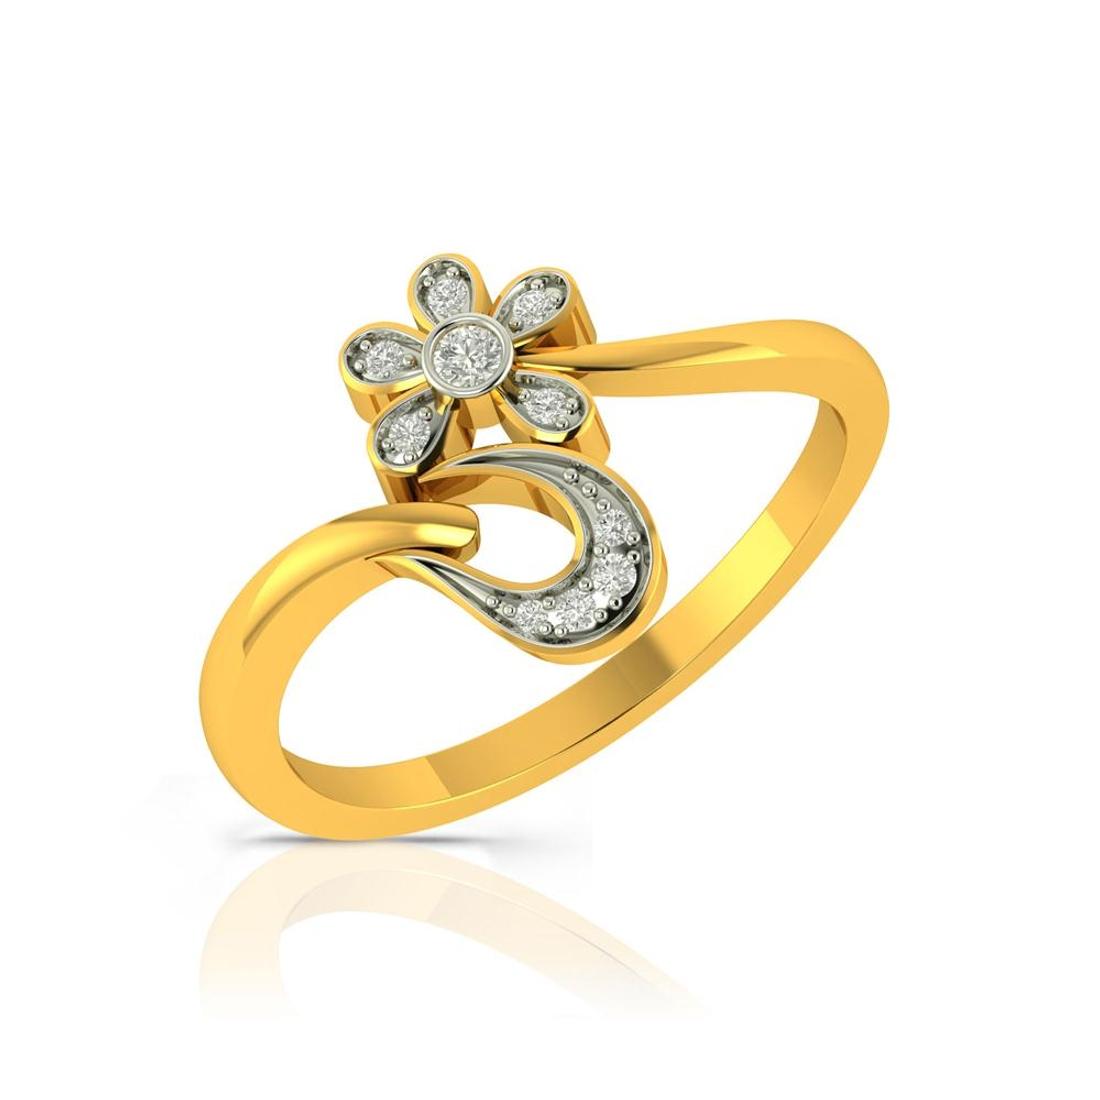 Buy Charu Jewels Diamond Ladies Ring CJLR0112 Online in India